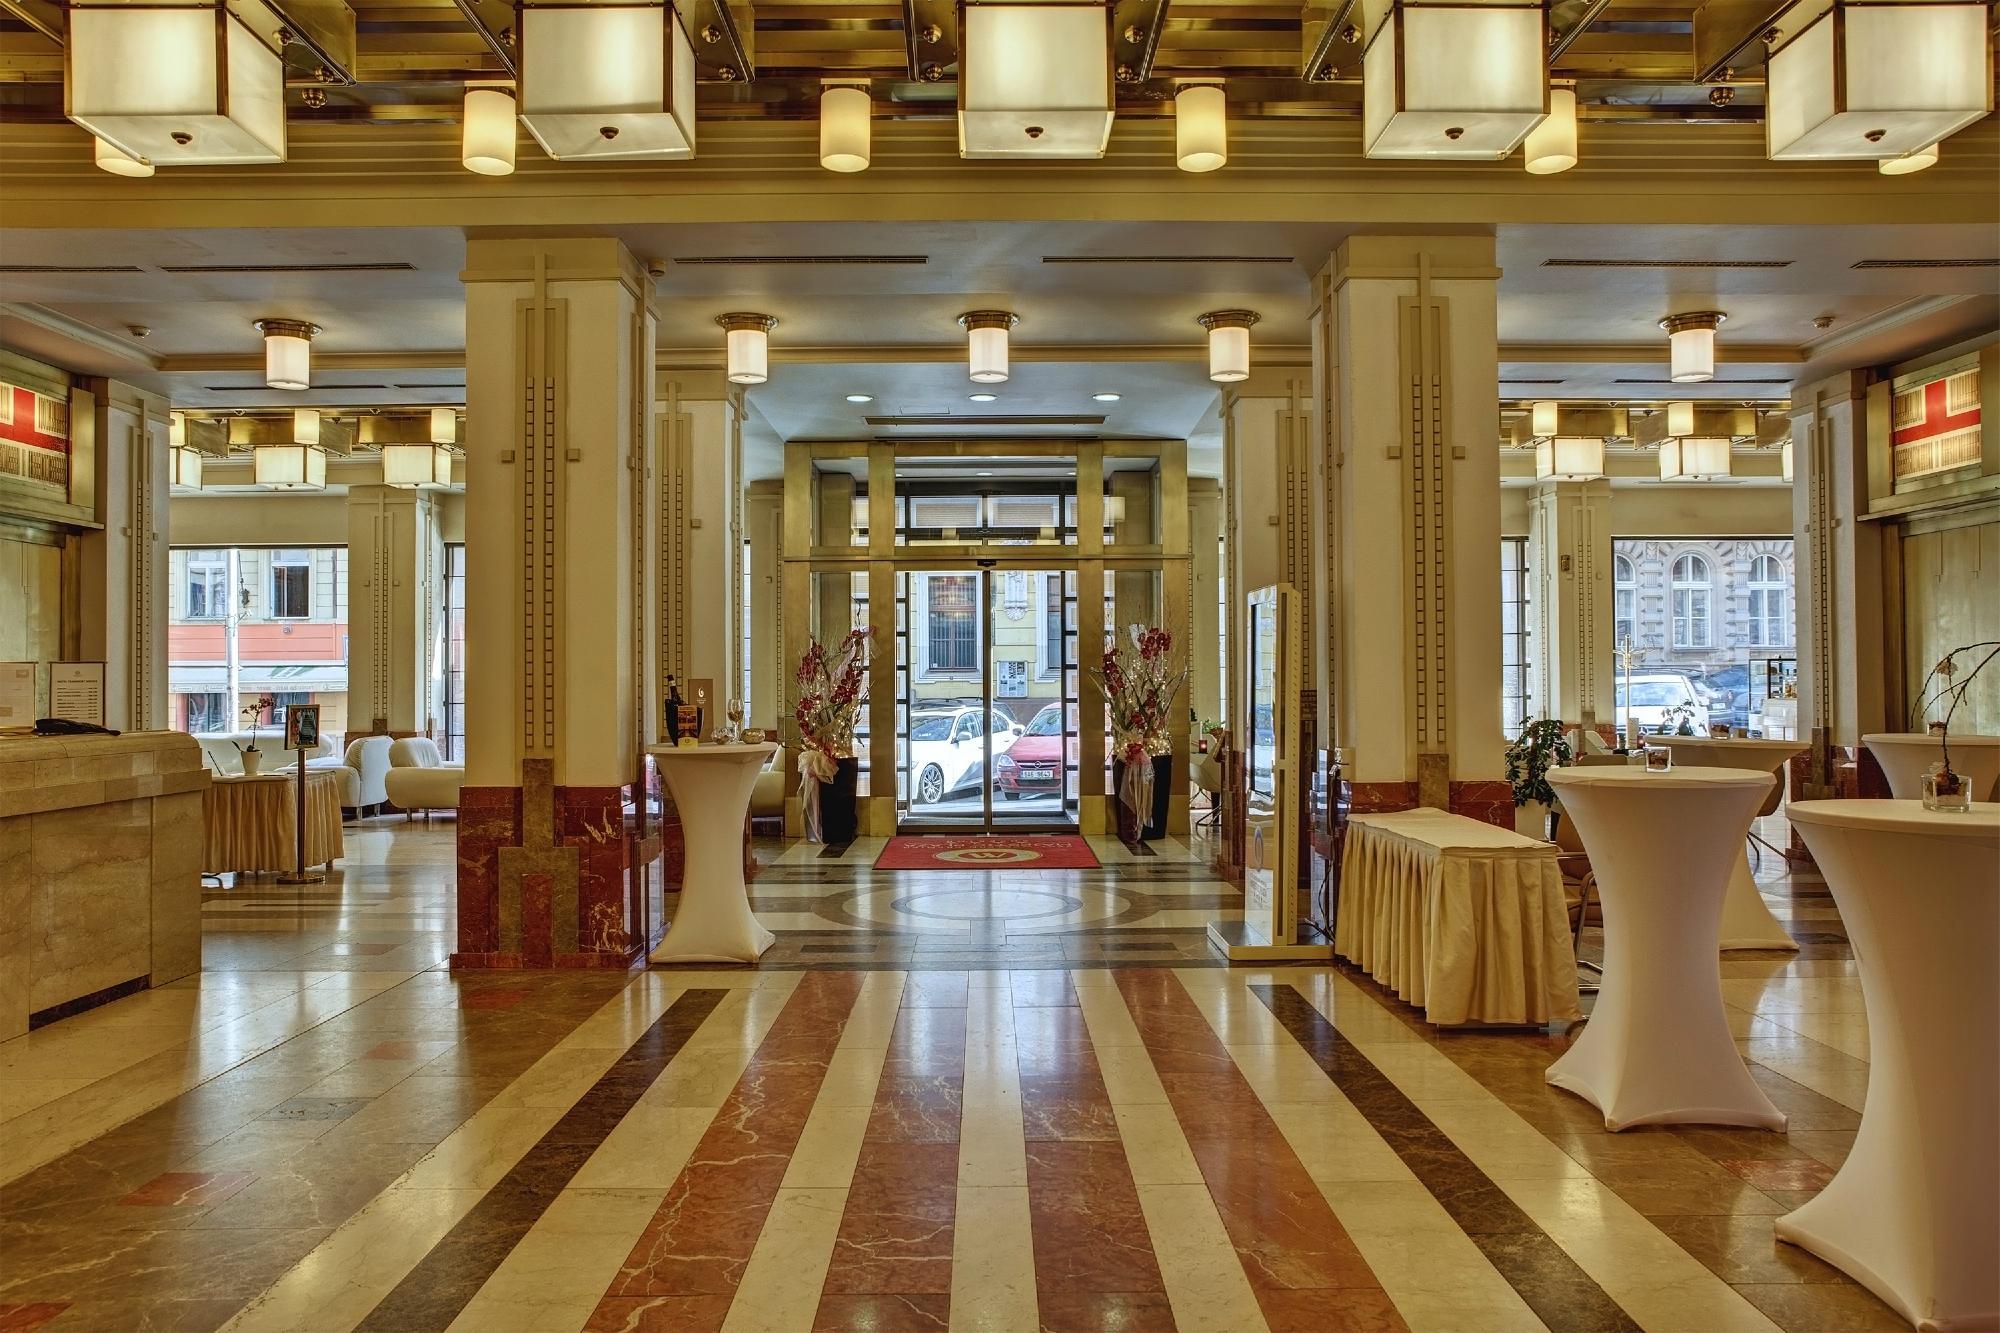 BEST WESTERN PREMIER Hotel Majestic Plaza